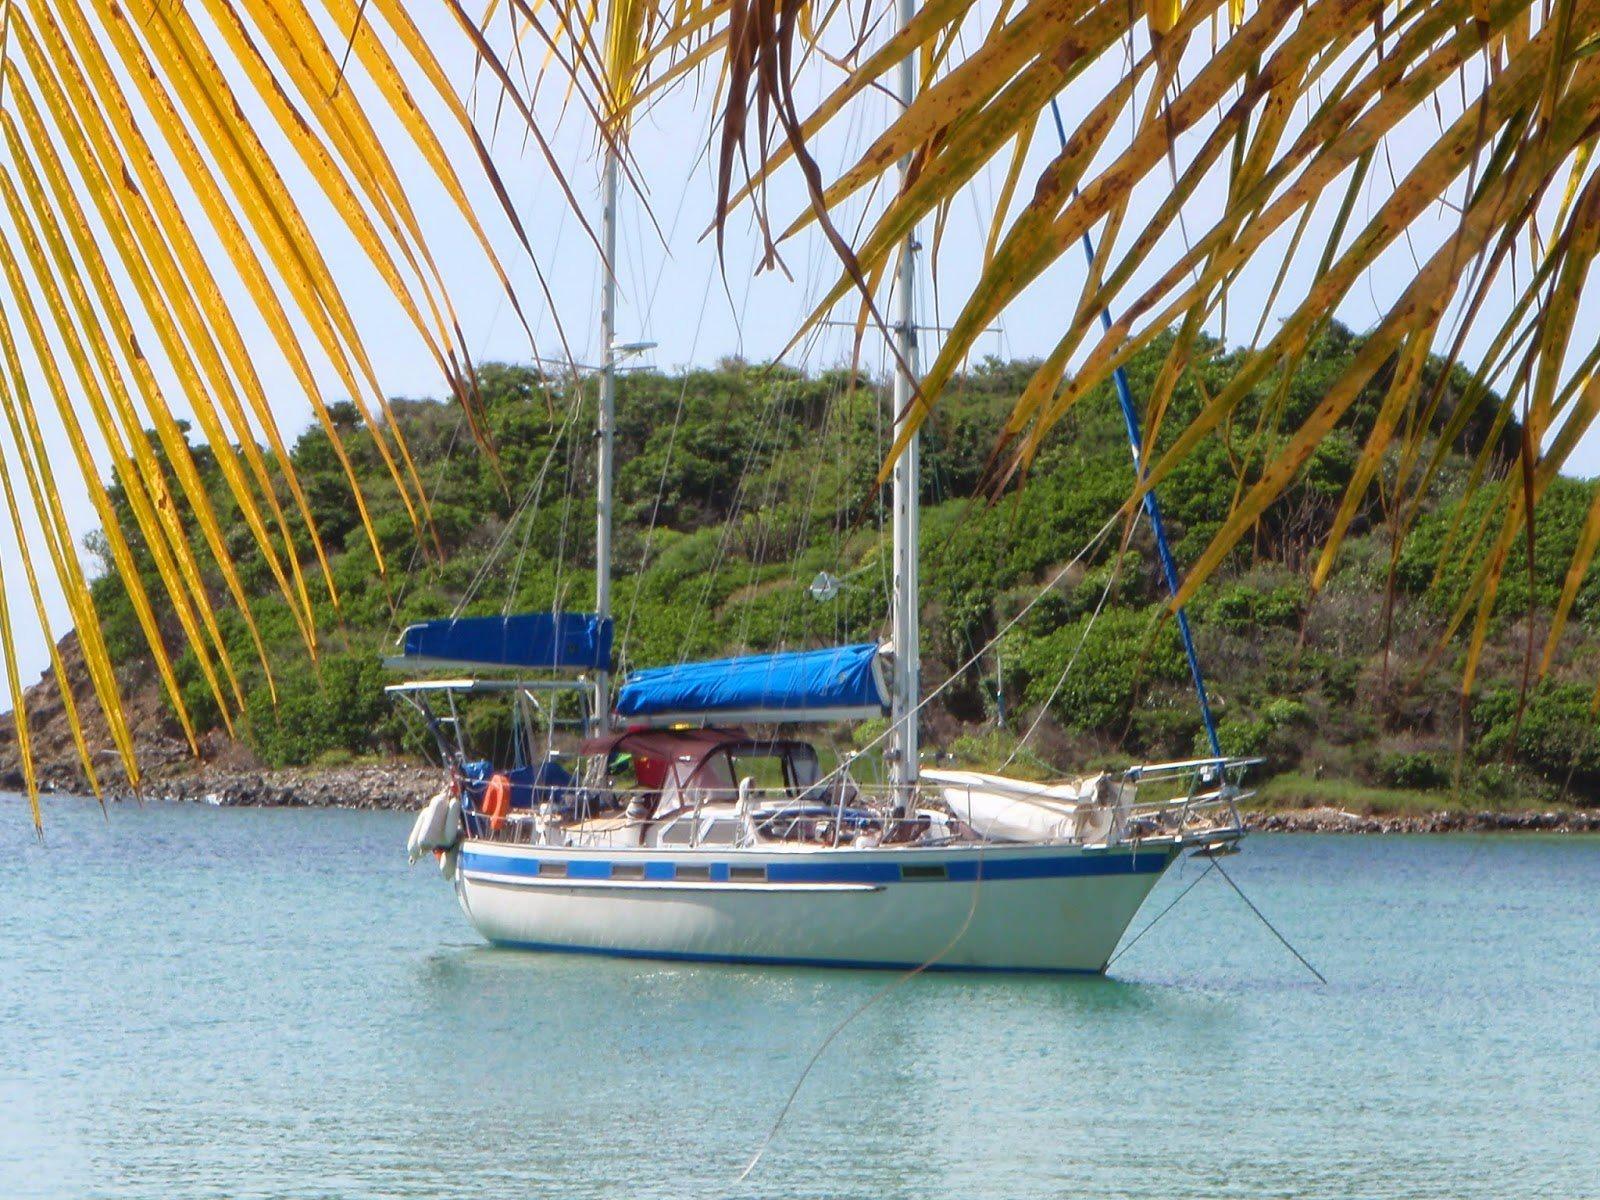 170 - Baleeiro - anchored